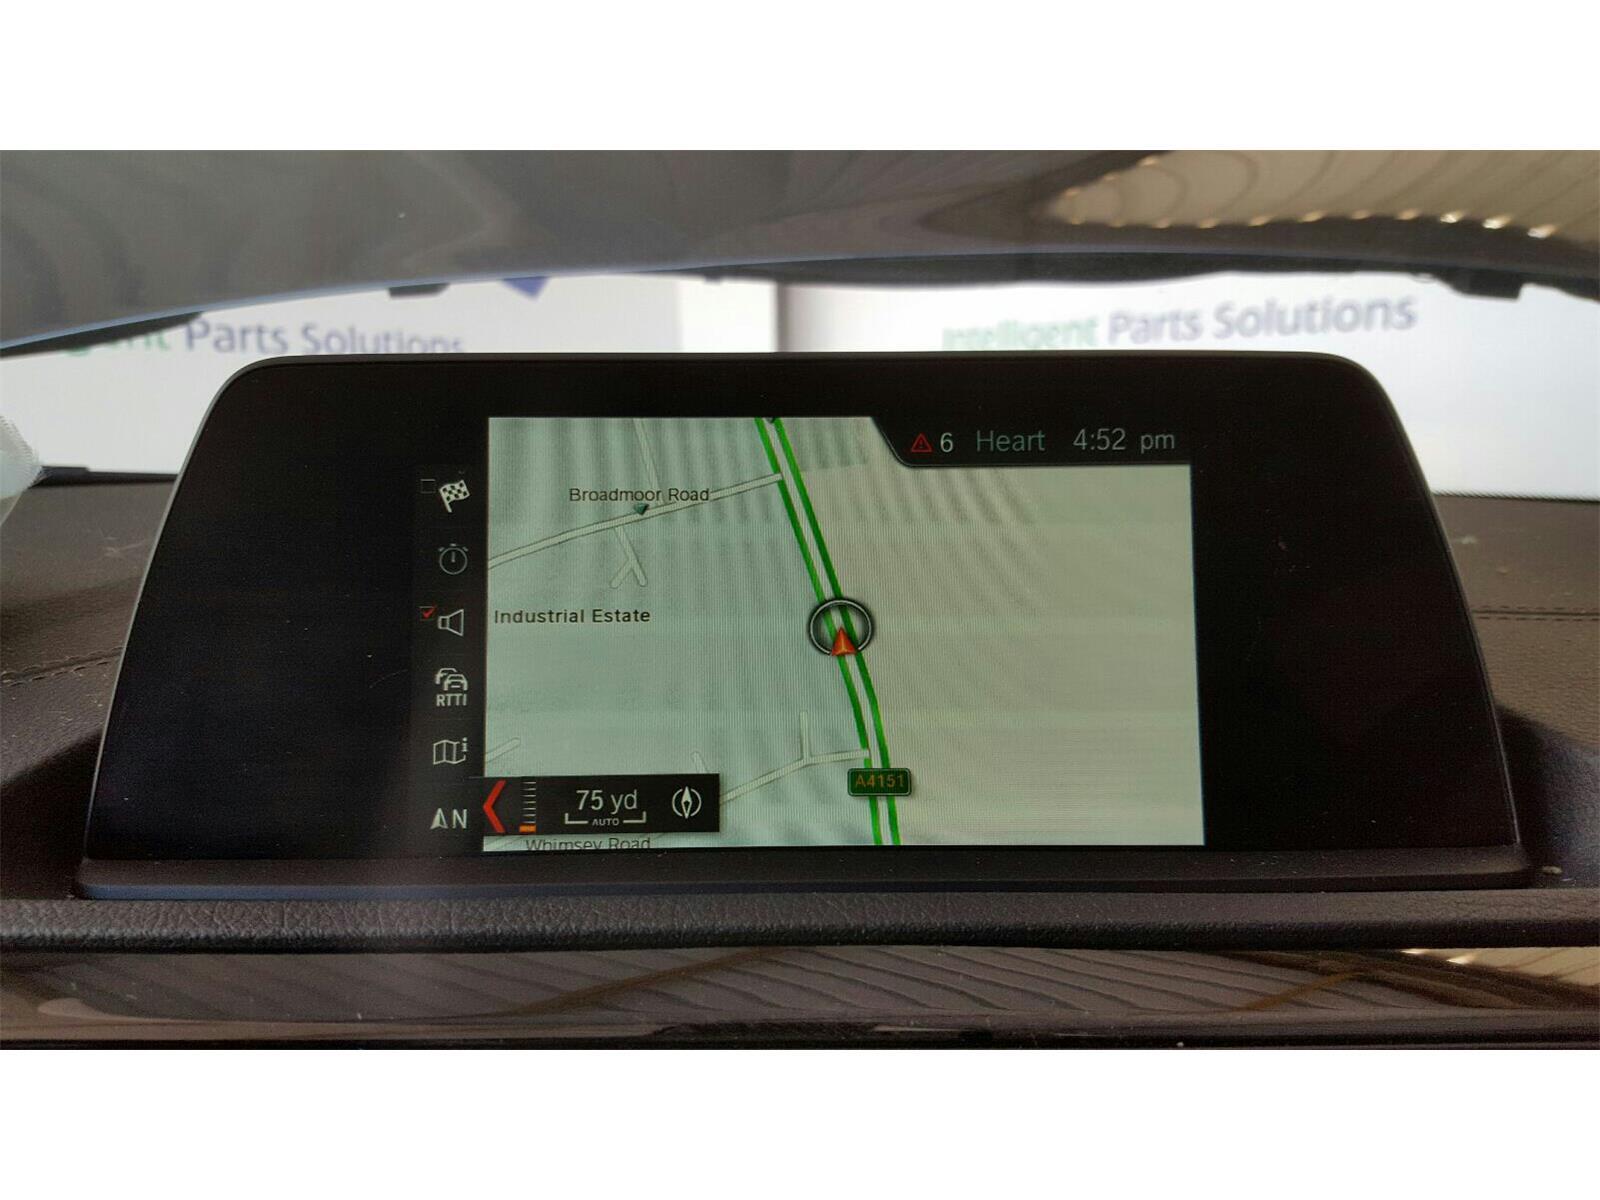 BMW 65 50 6 837 128Central information display�1,659.93F 1   6,5